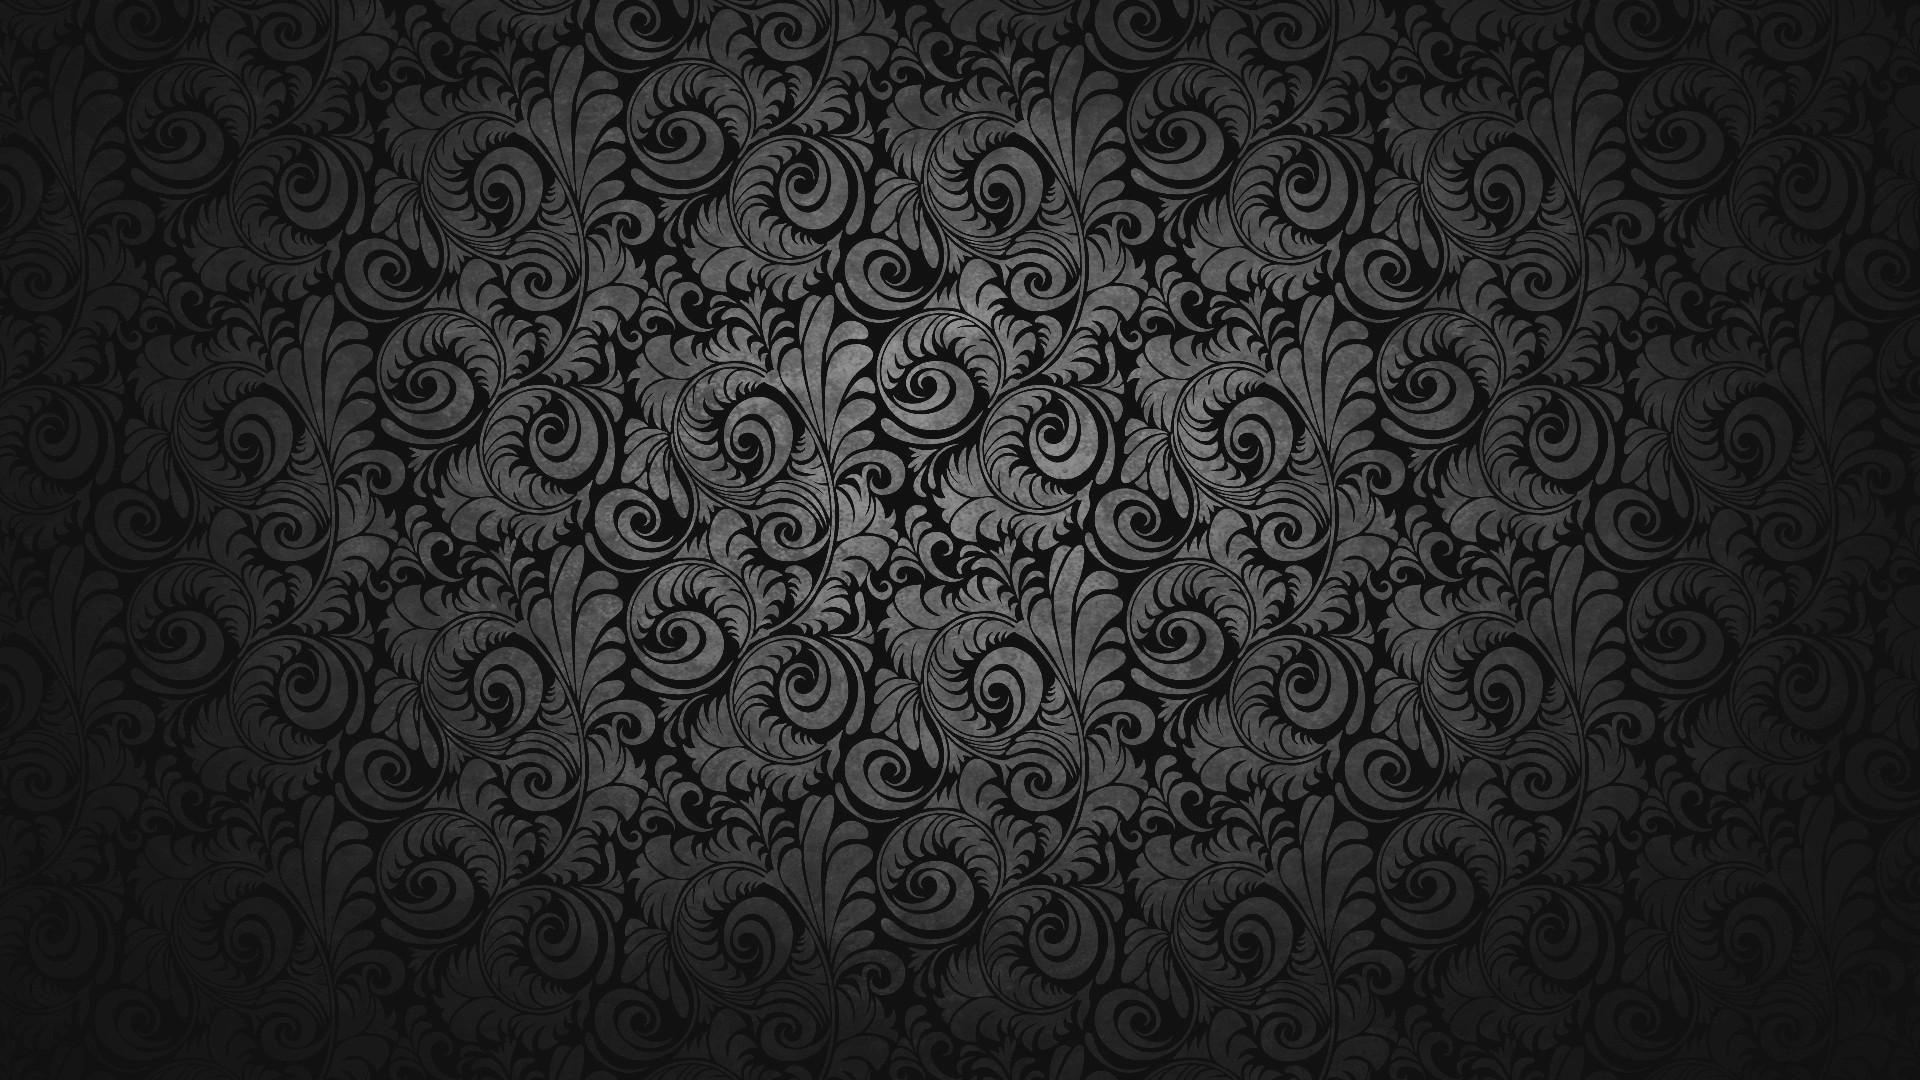 Chic Dark Black Abstract Flower Classic Motif Legend Background Hd Wallpaper